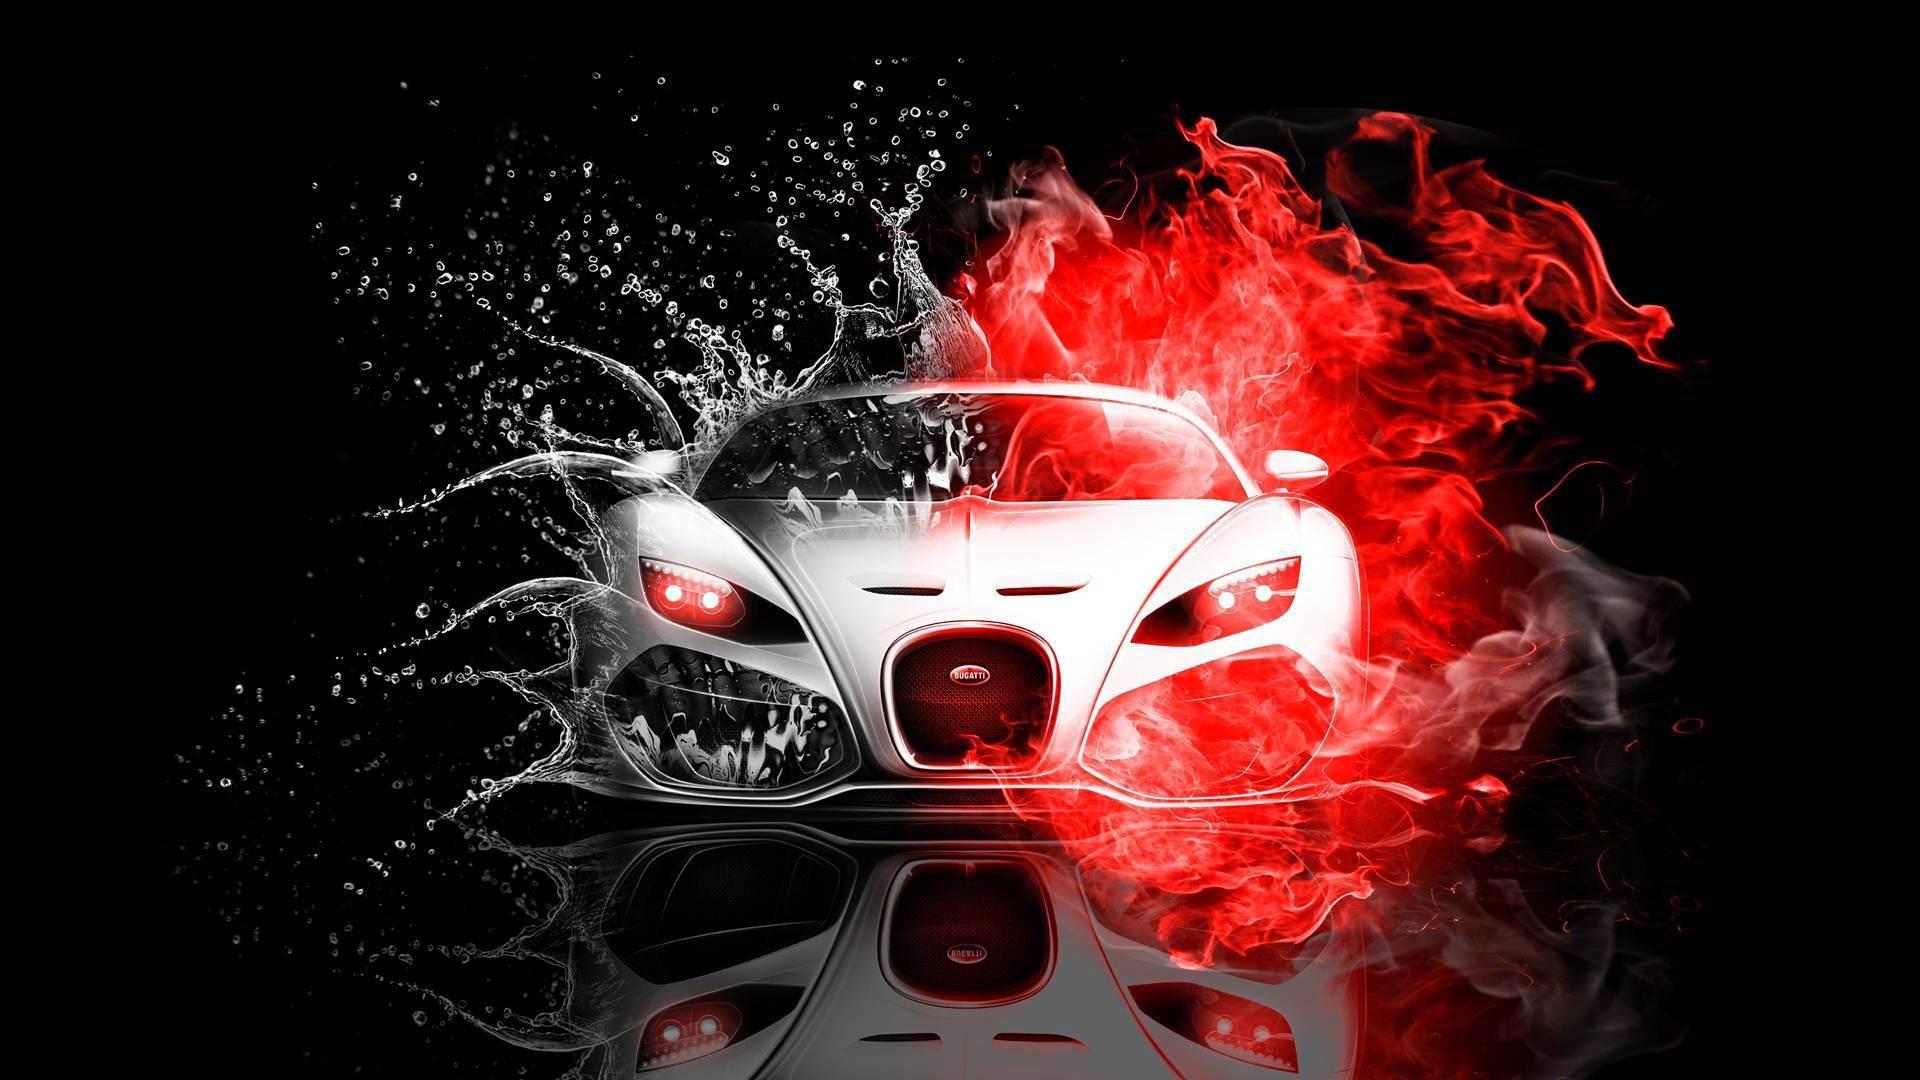 furious 7 car lykan hypersport hd wallpaper stylish hd wallpapers - Fast And Furious 7 Cars Iphone Wallpapers